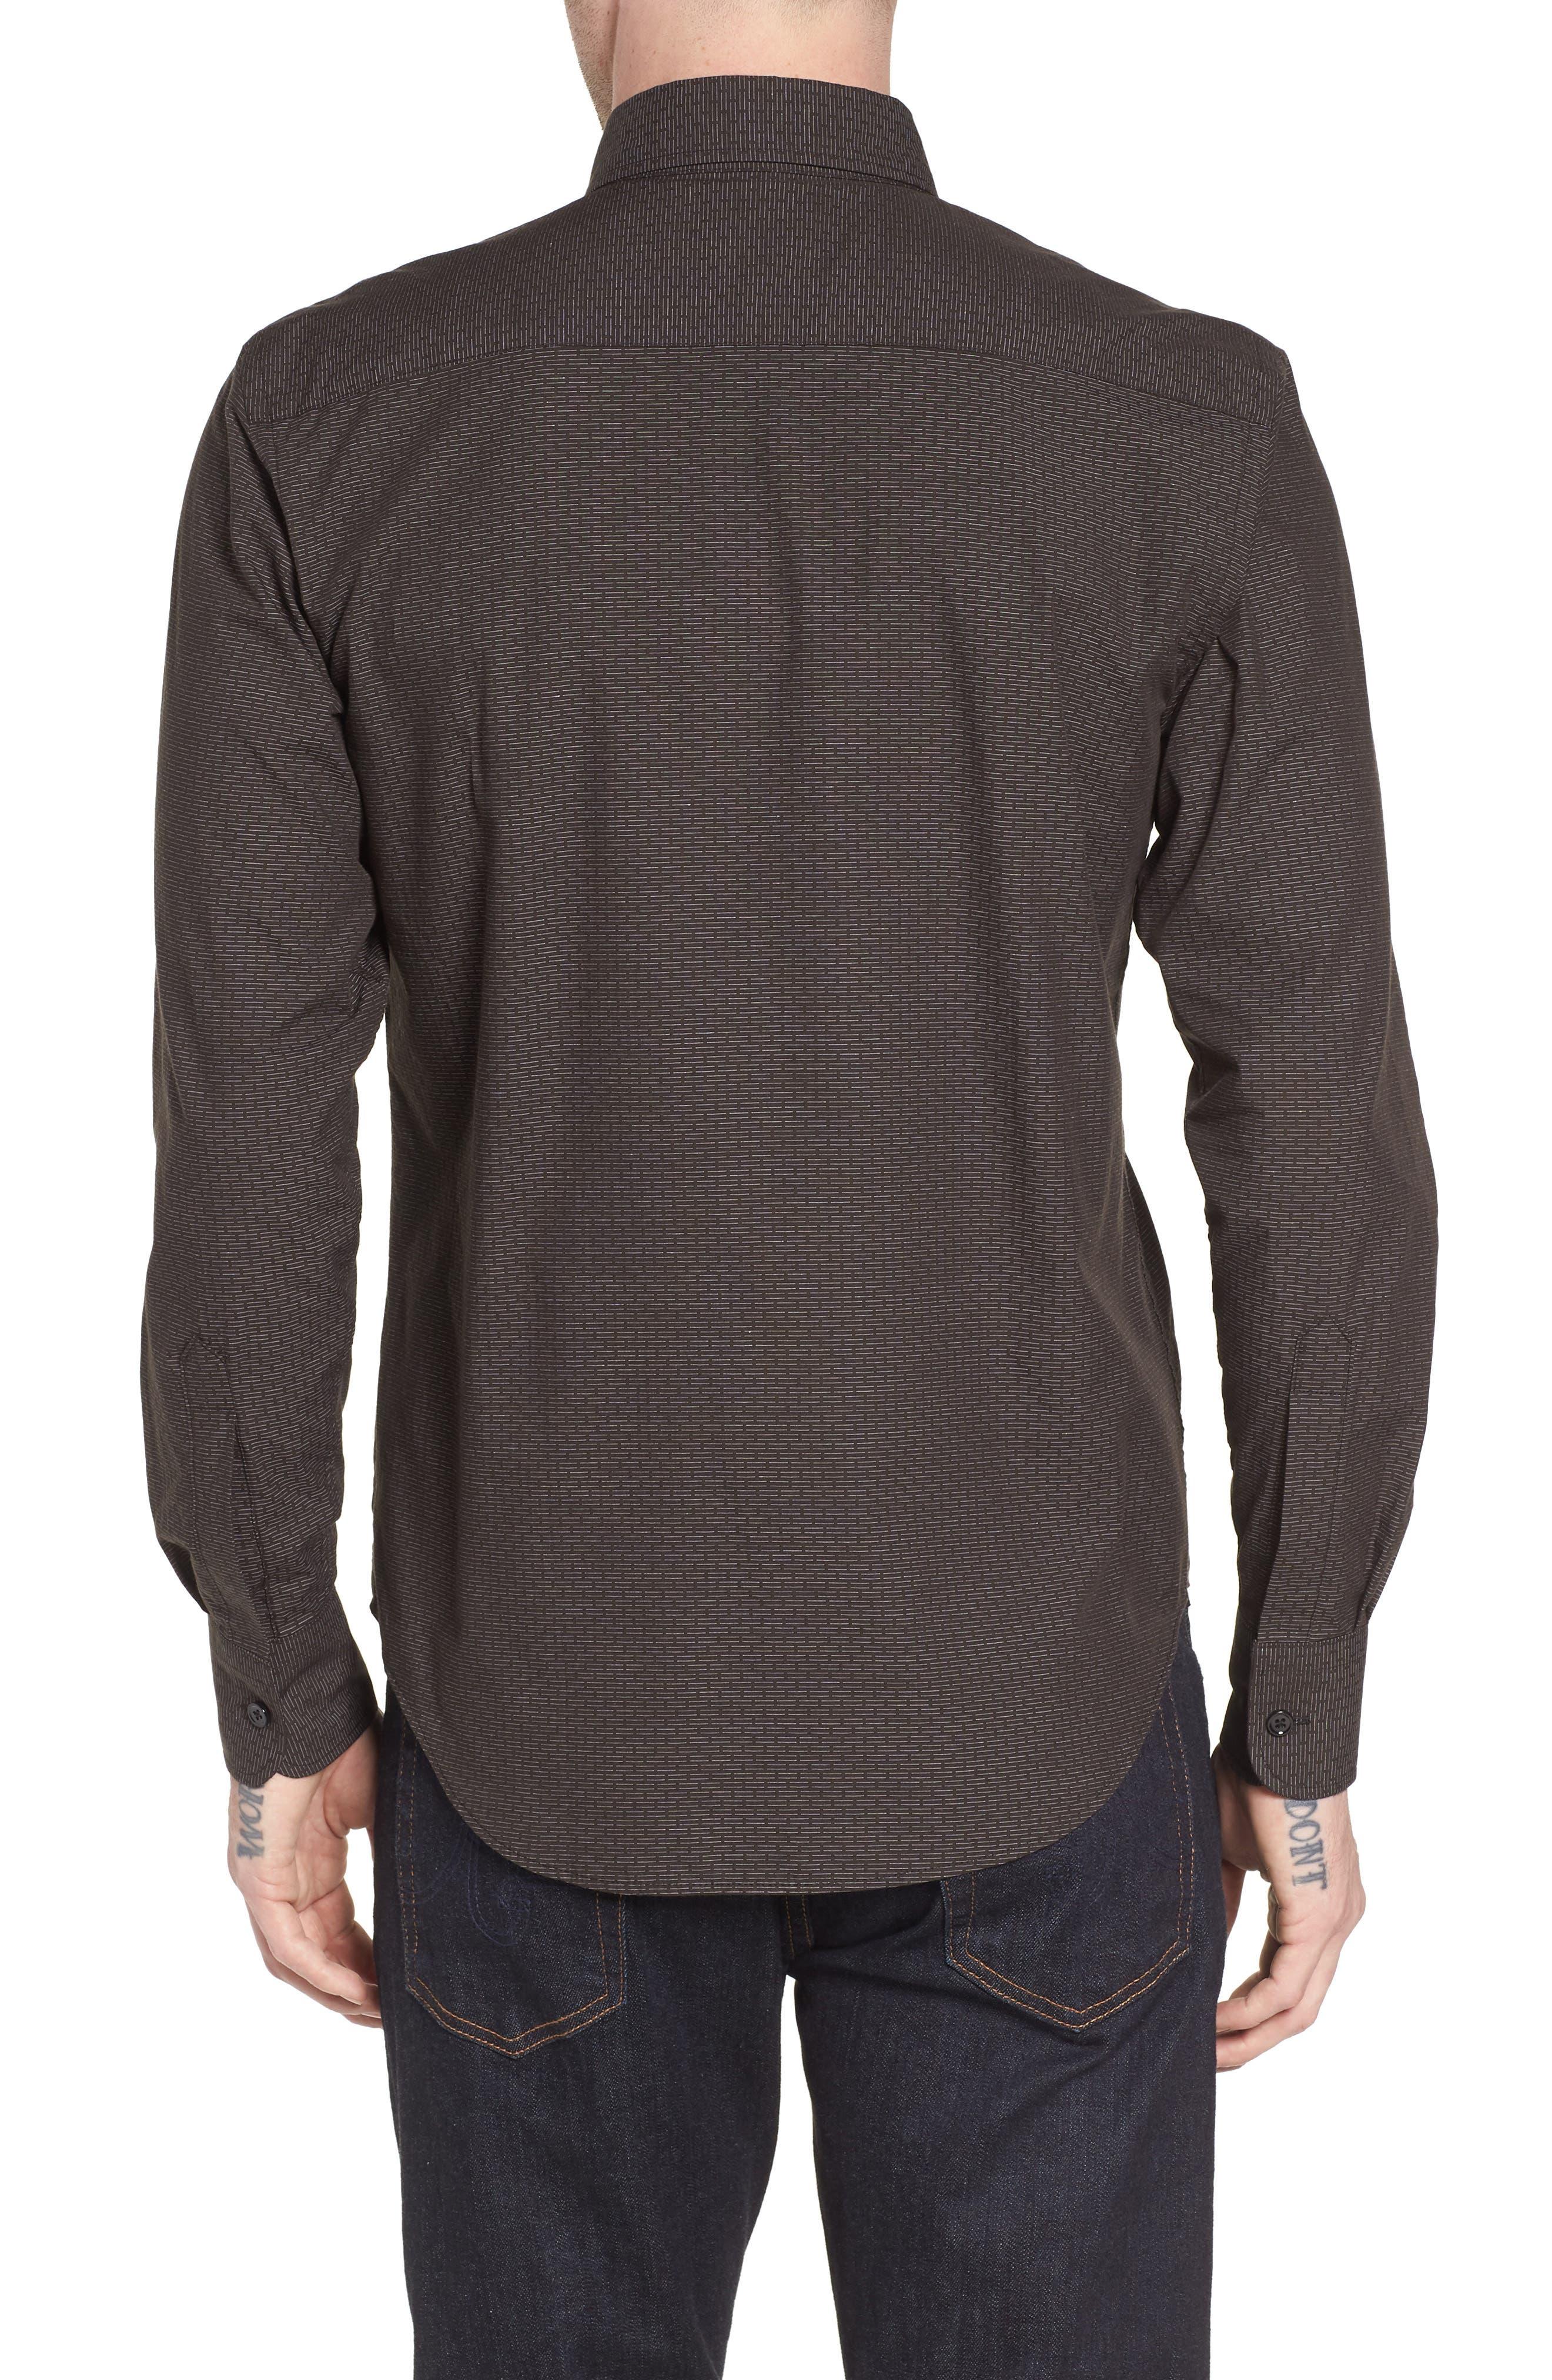 Naked & Famous Dobby Woven Shirt,                             Alternate thumbnail 2, color,                             001